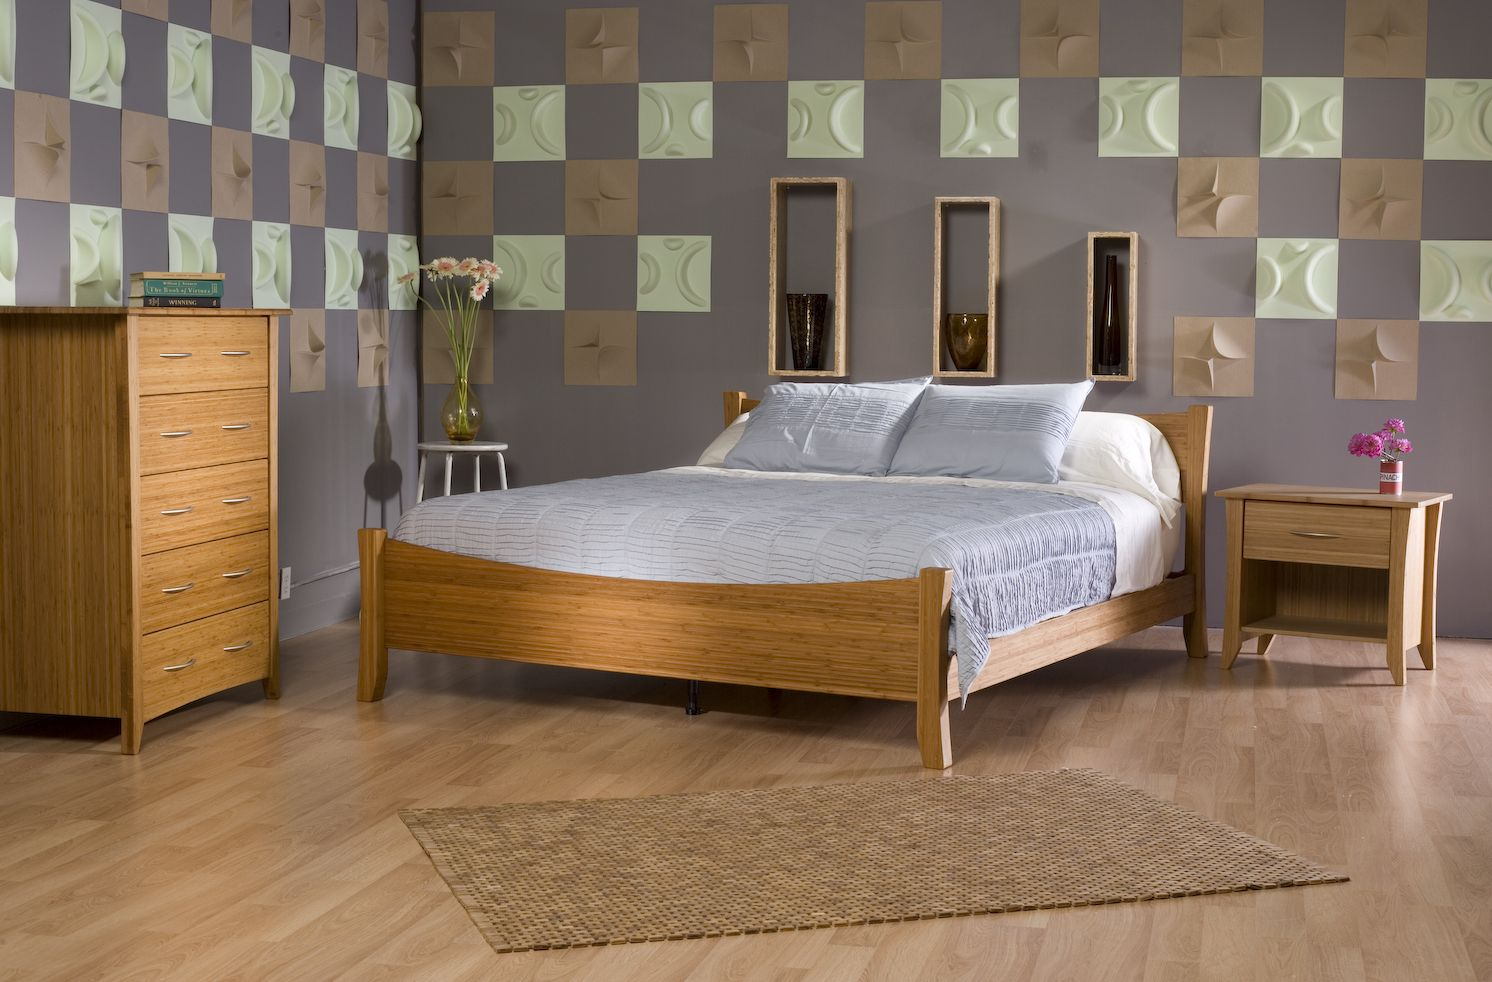 Eco Friendly Bedroom Furniture Eco Friendly Bedroom Ideas Pure